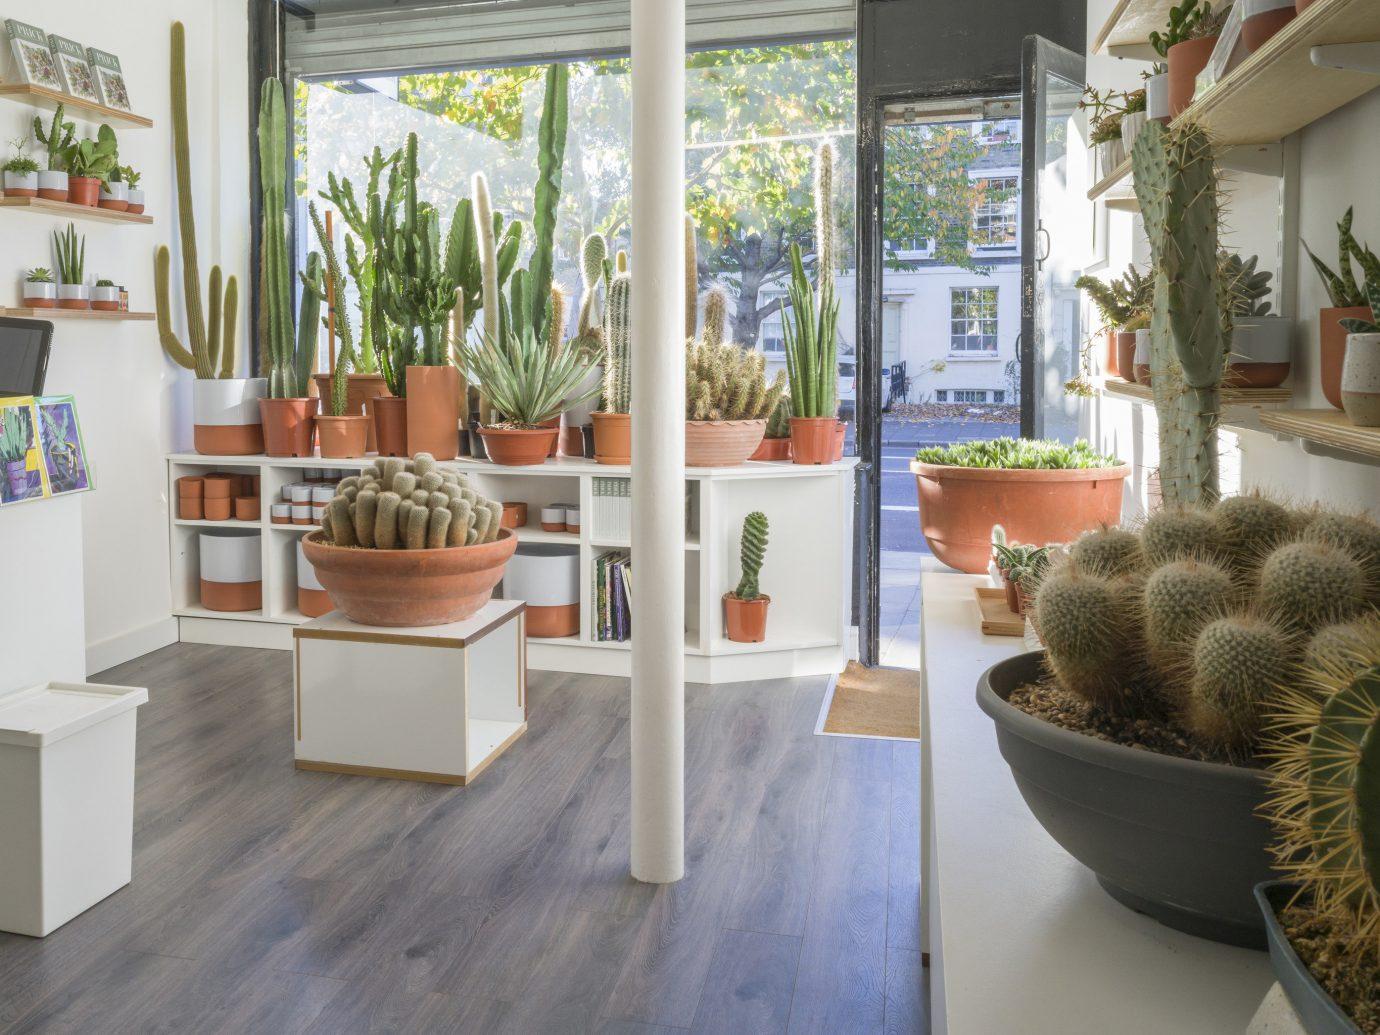 Offbeat Style + Design Travel Trends plant indoor floor cactus interior design flowerpot agave real estate houseplant living room furniture flowering plant tub